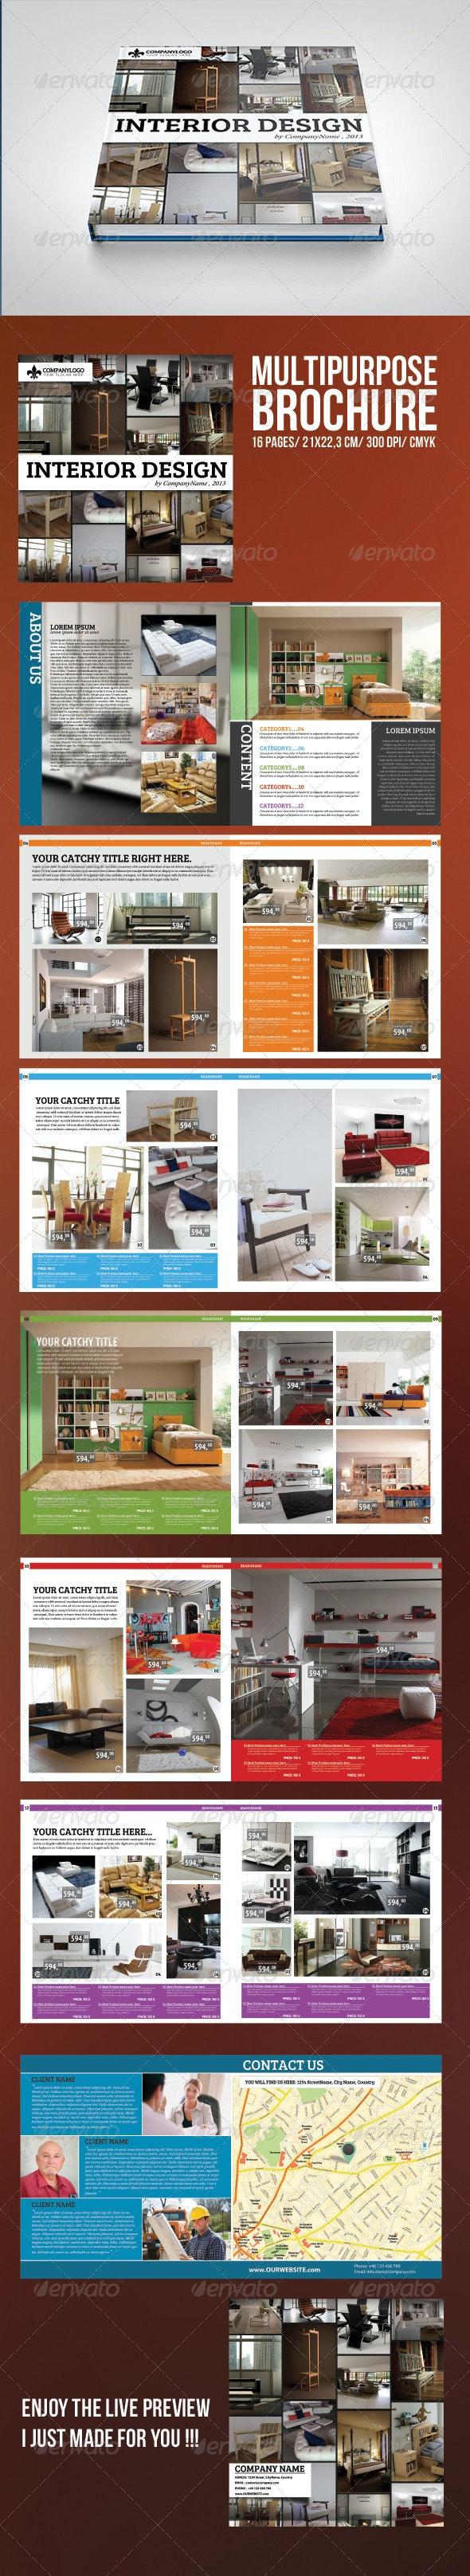 Multipurpose Brochure Template - Print Templates